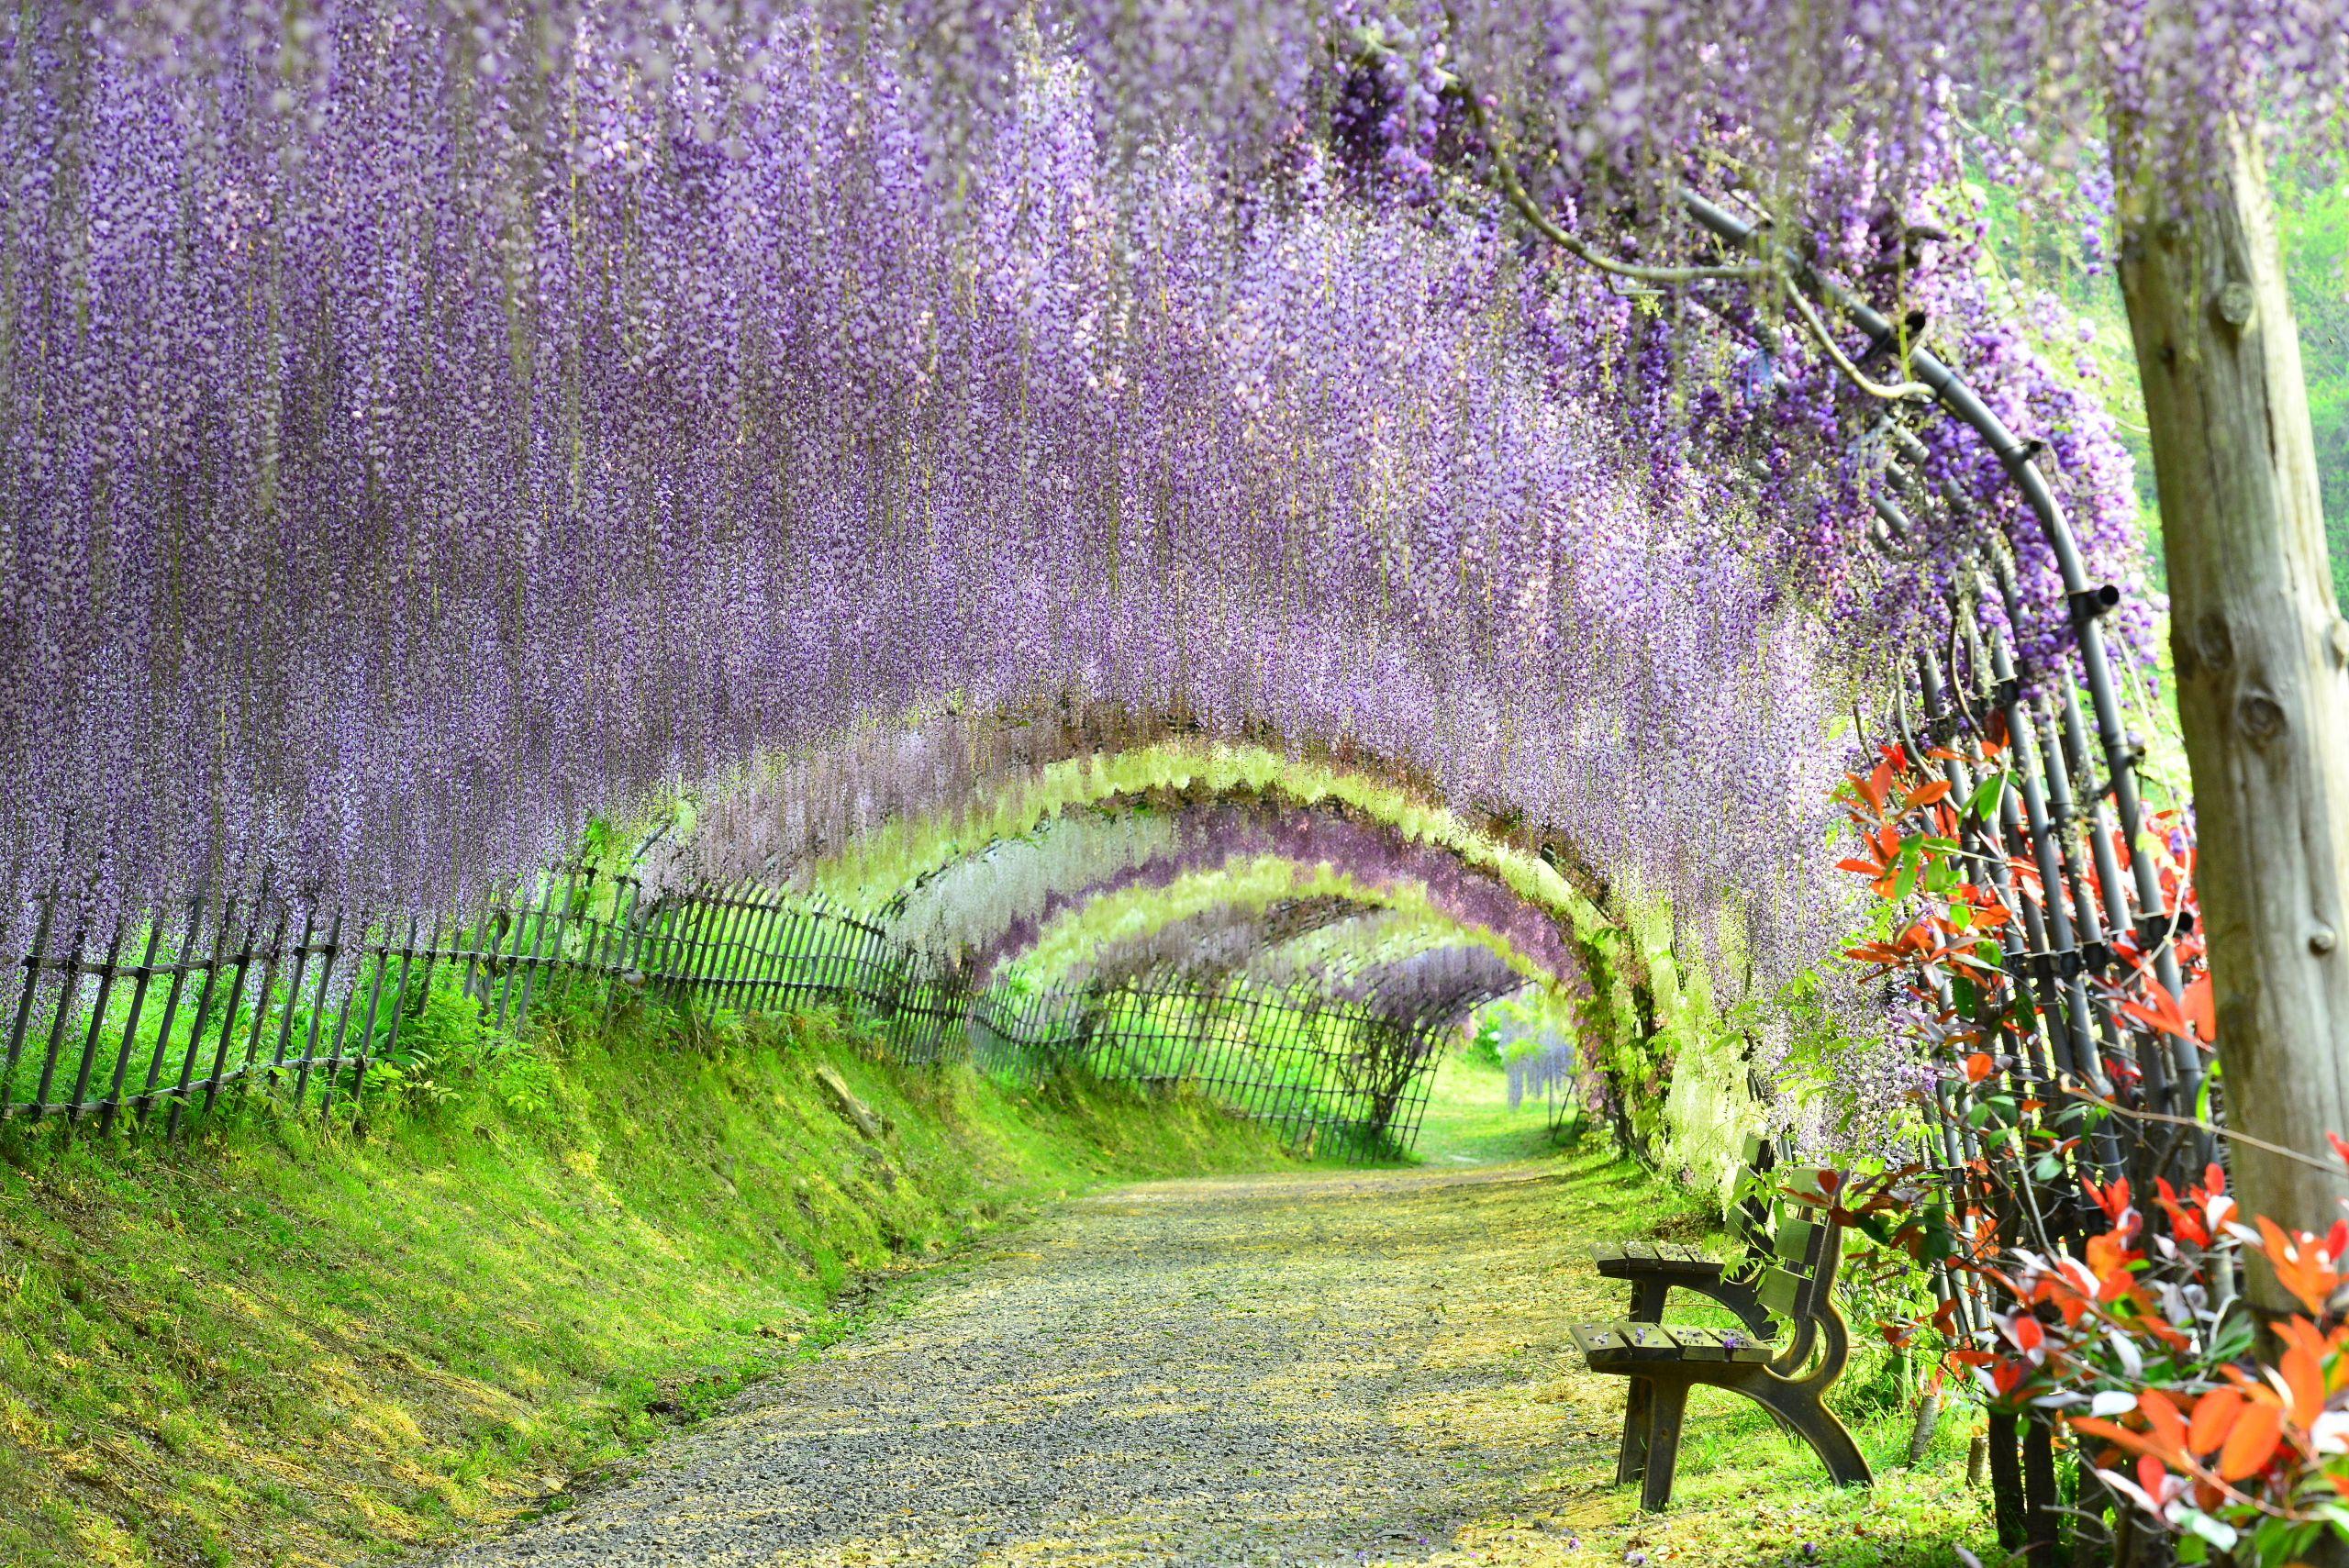 the wisteria flower tunnel at kawachi fuji garden, kitakyushu